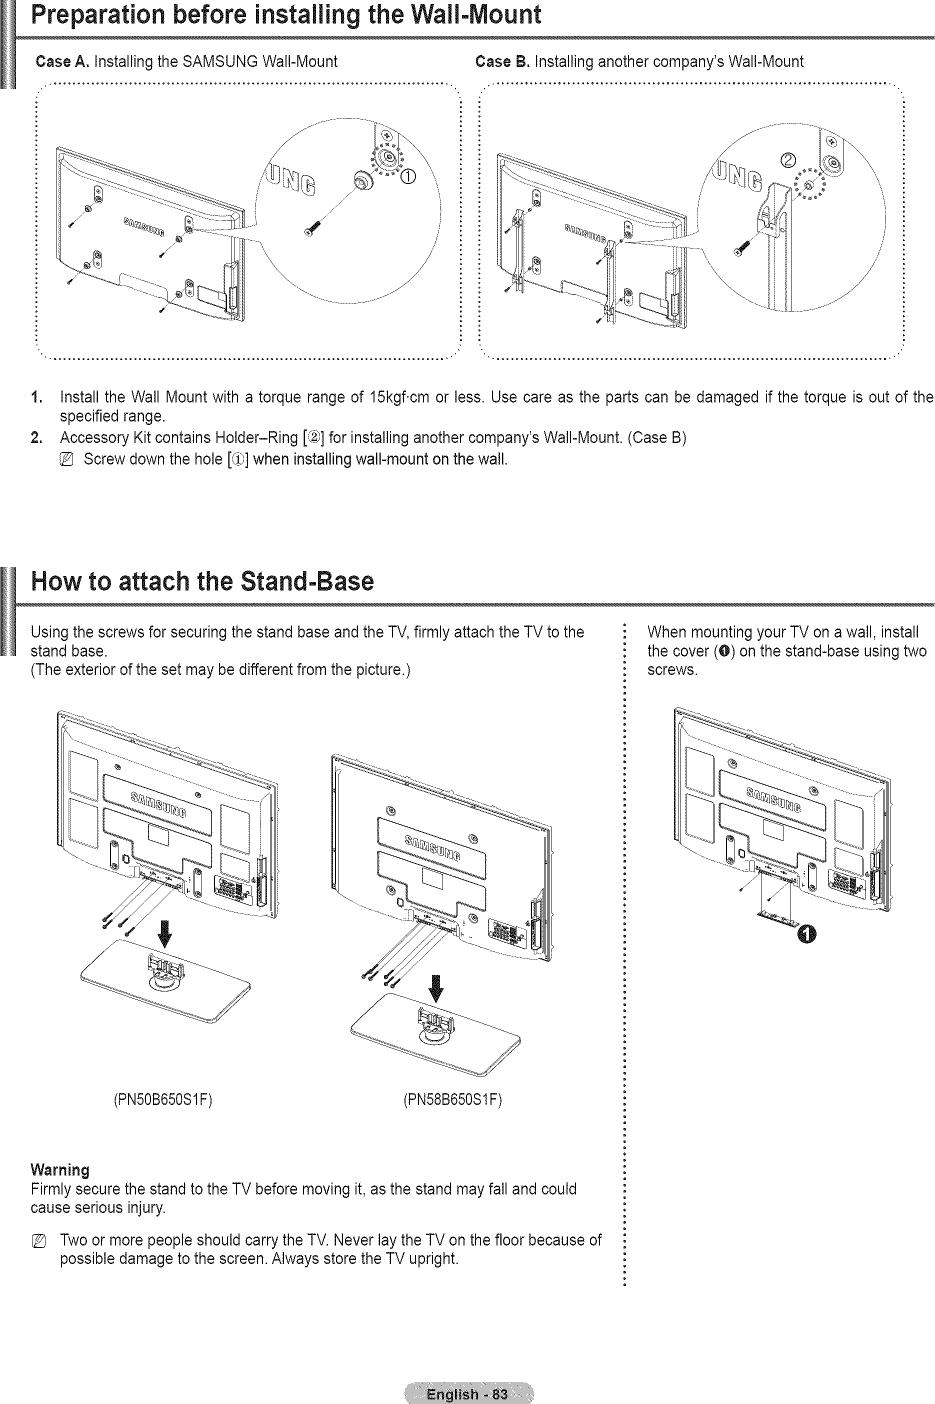 Samsung plasma television manual l0904120 page 83 of 97 samsung plasma television manual l0904120 pooptronica Gallery